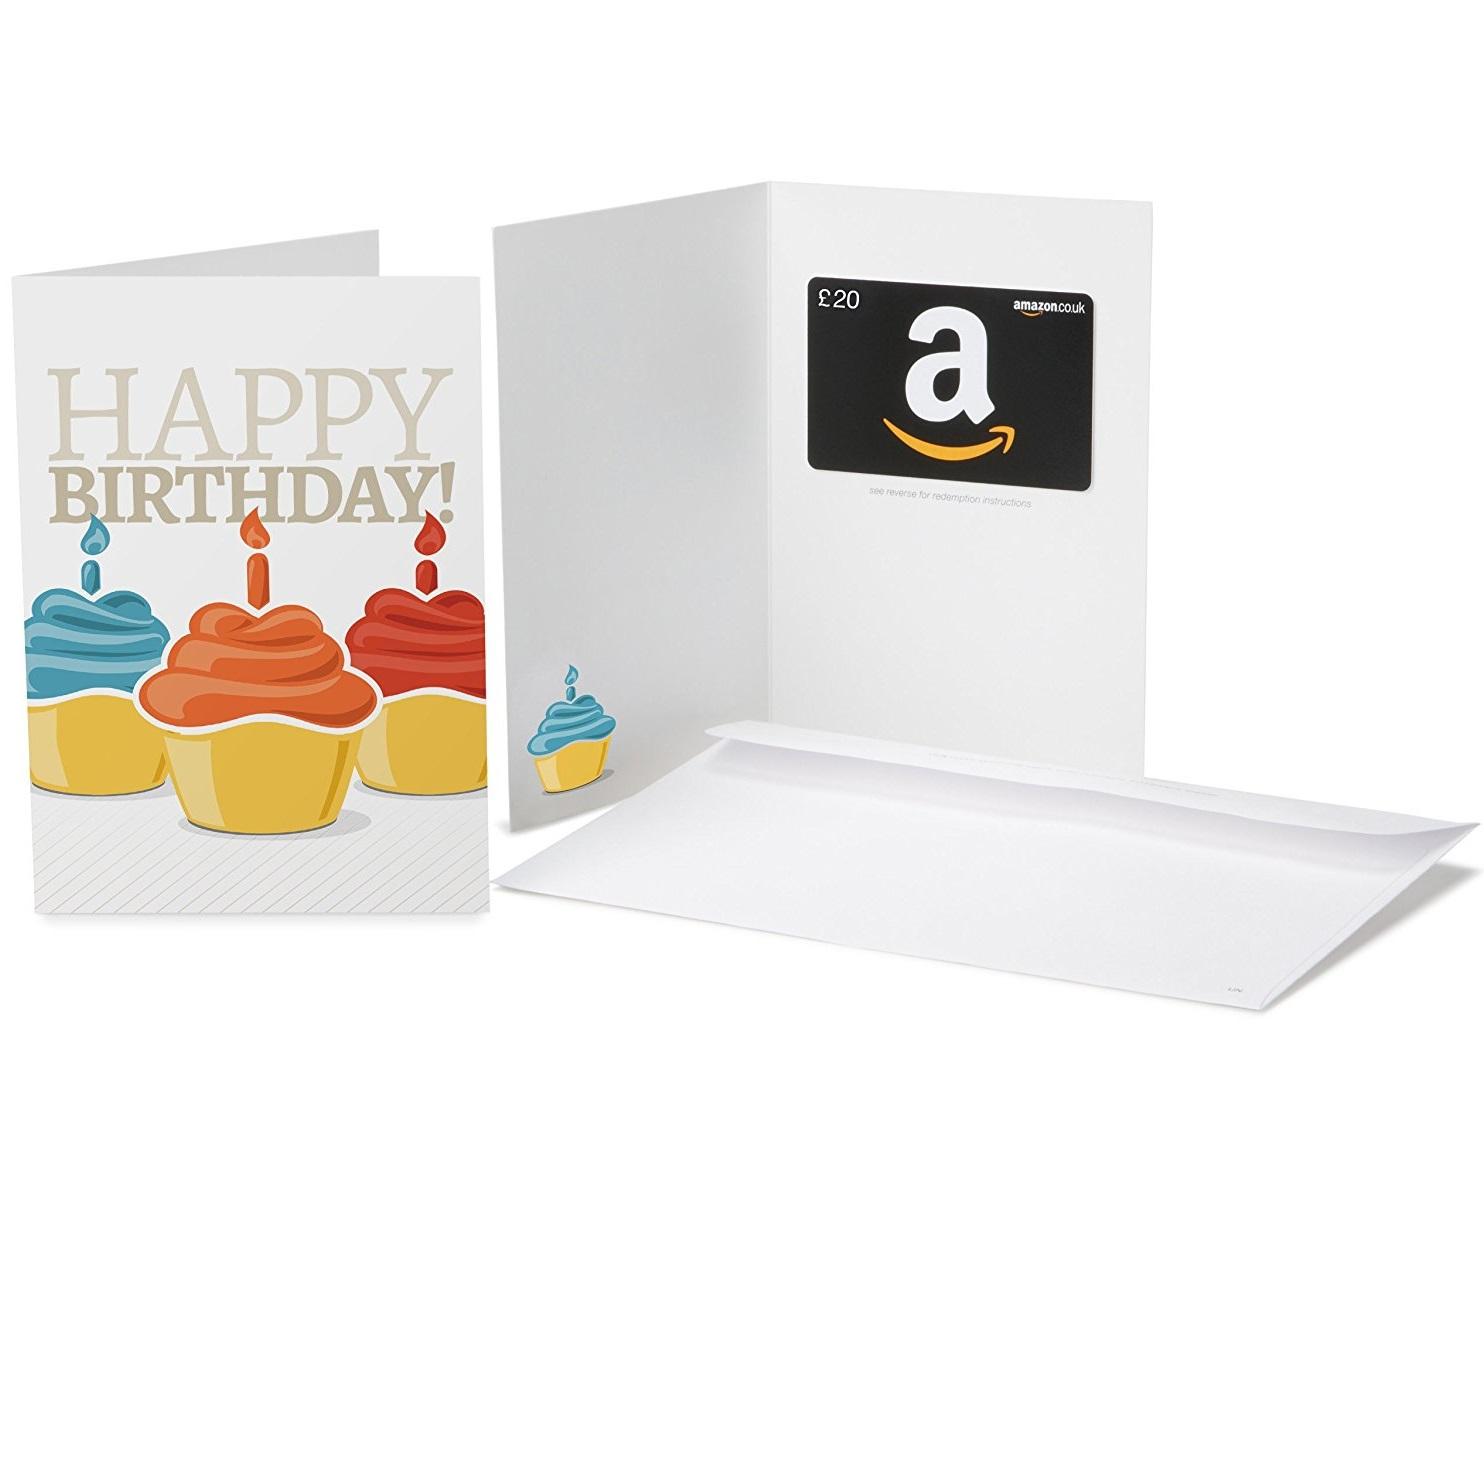 Amazon.co.uk: Gift Cards